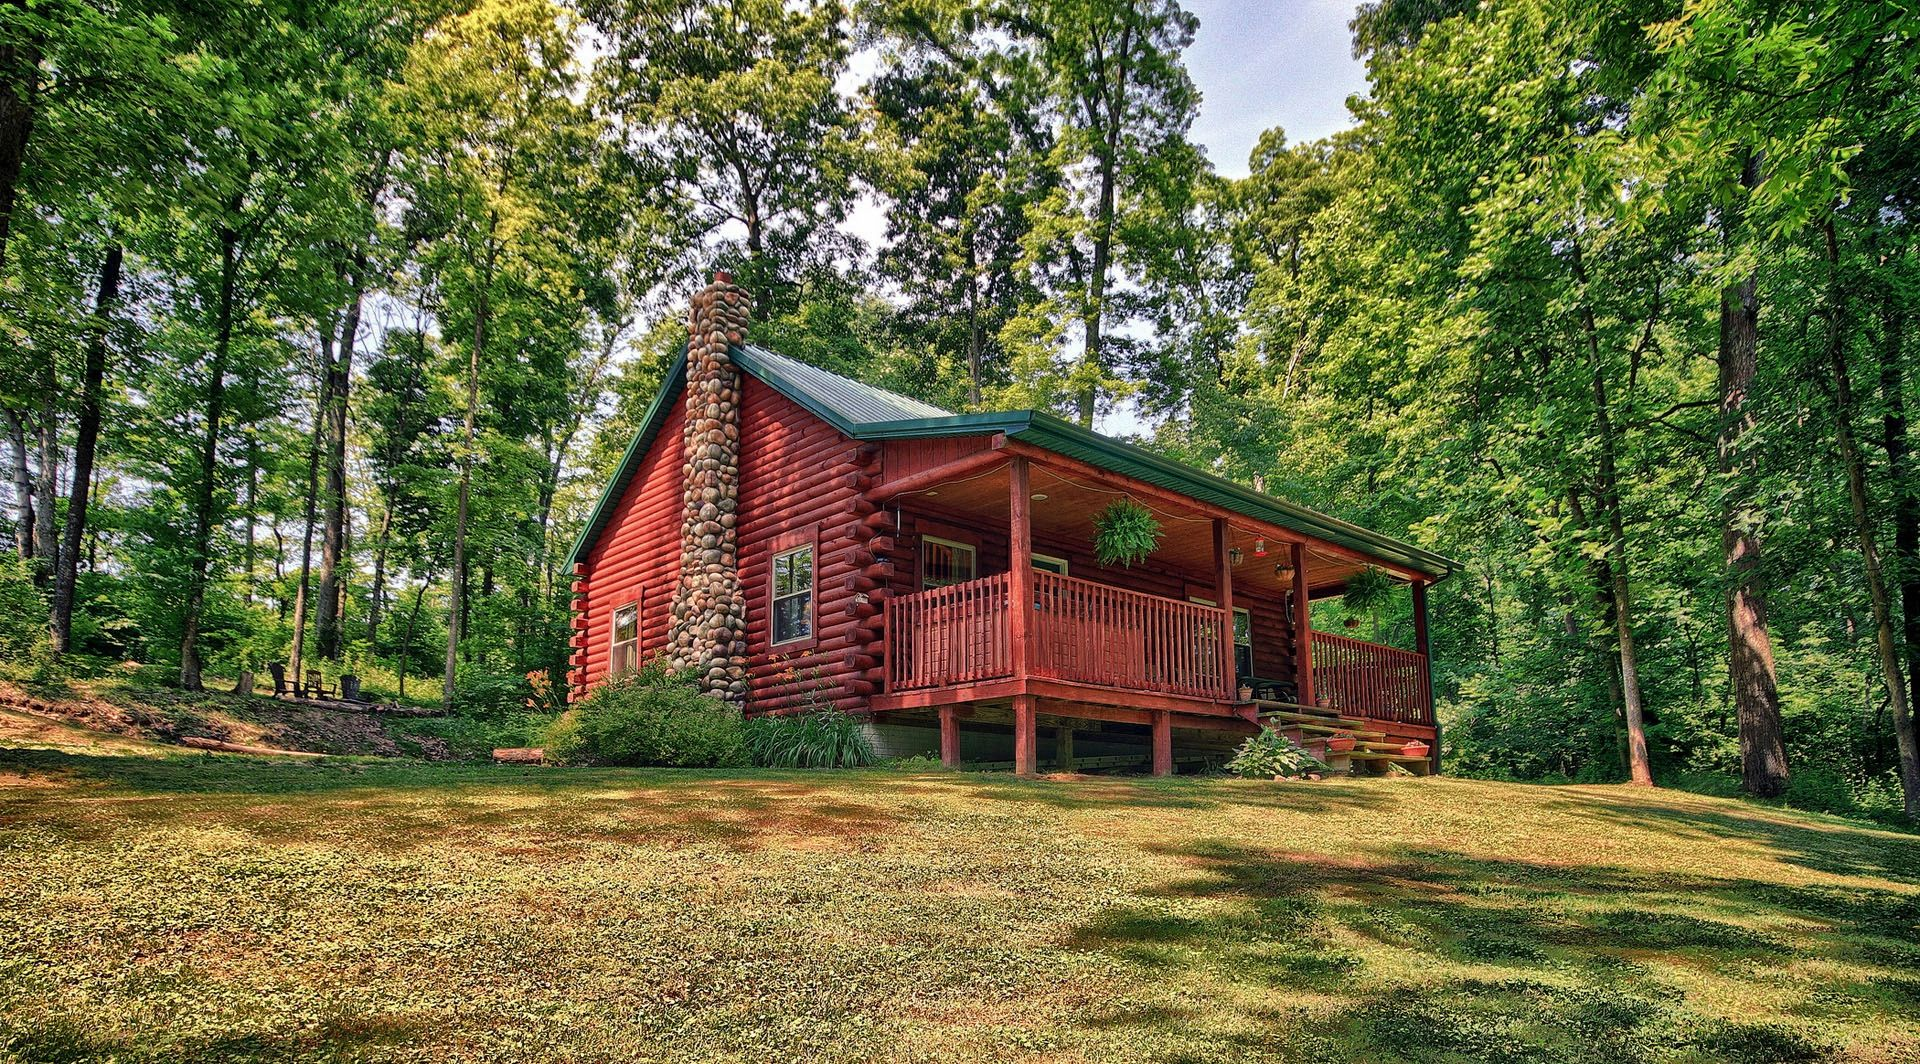 bentree cabin pin lodging romantic hills buffalo hocking lodge ohio and lodges getaways company in cabins